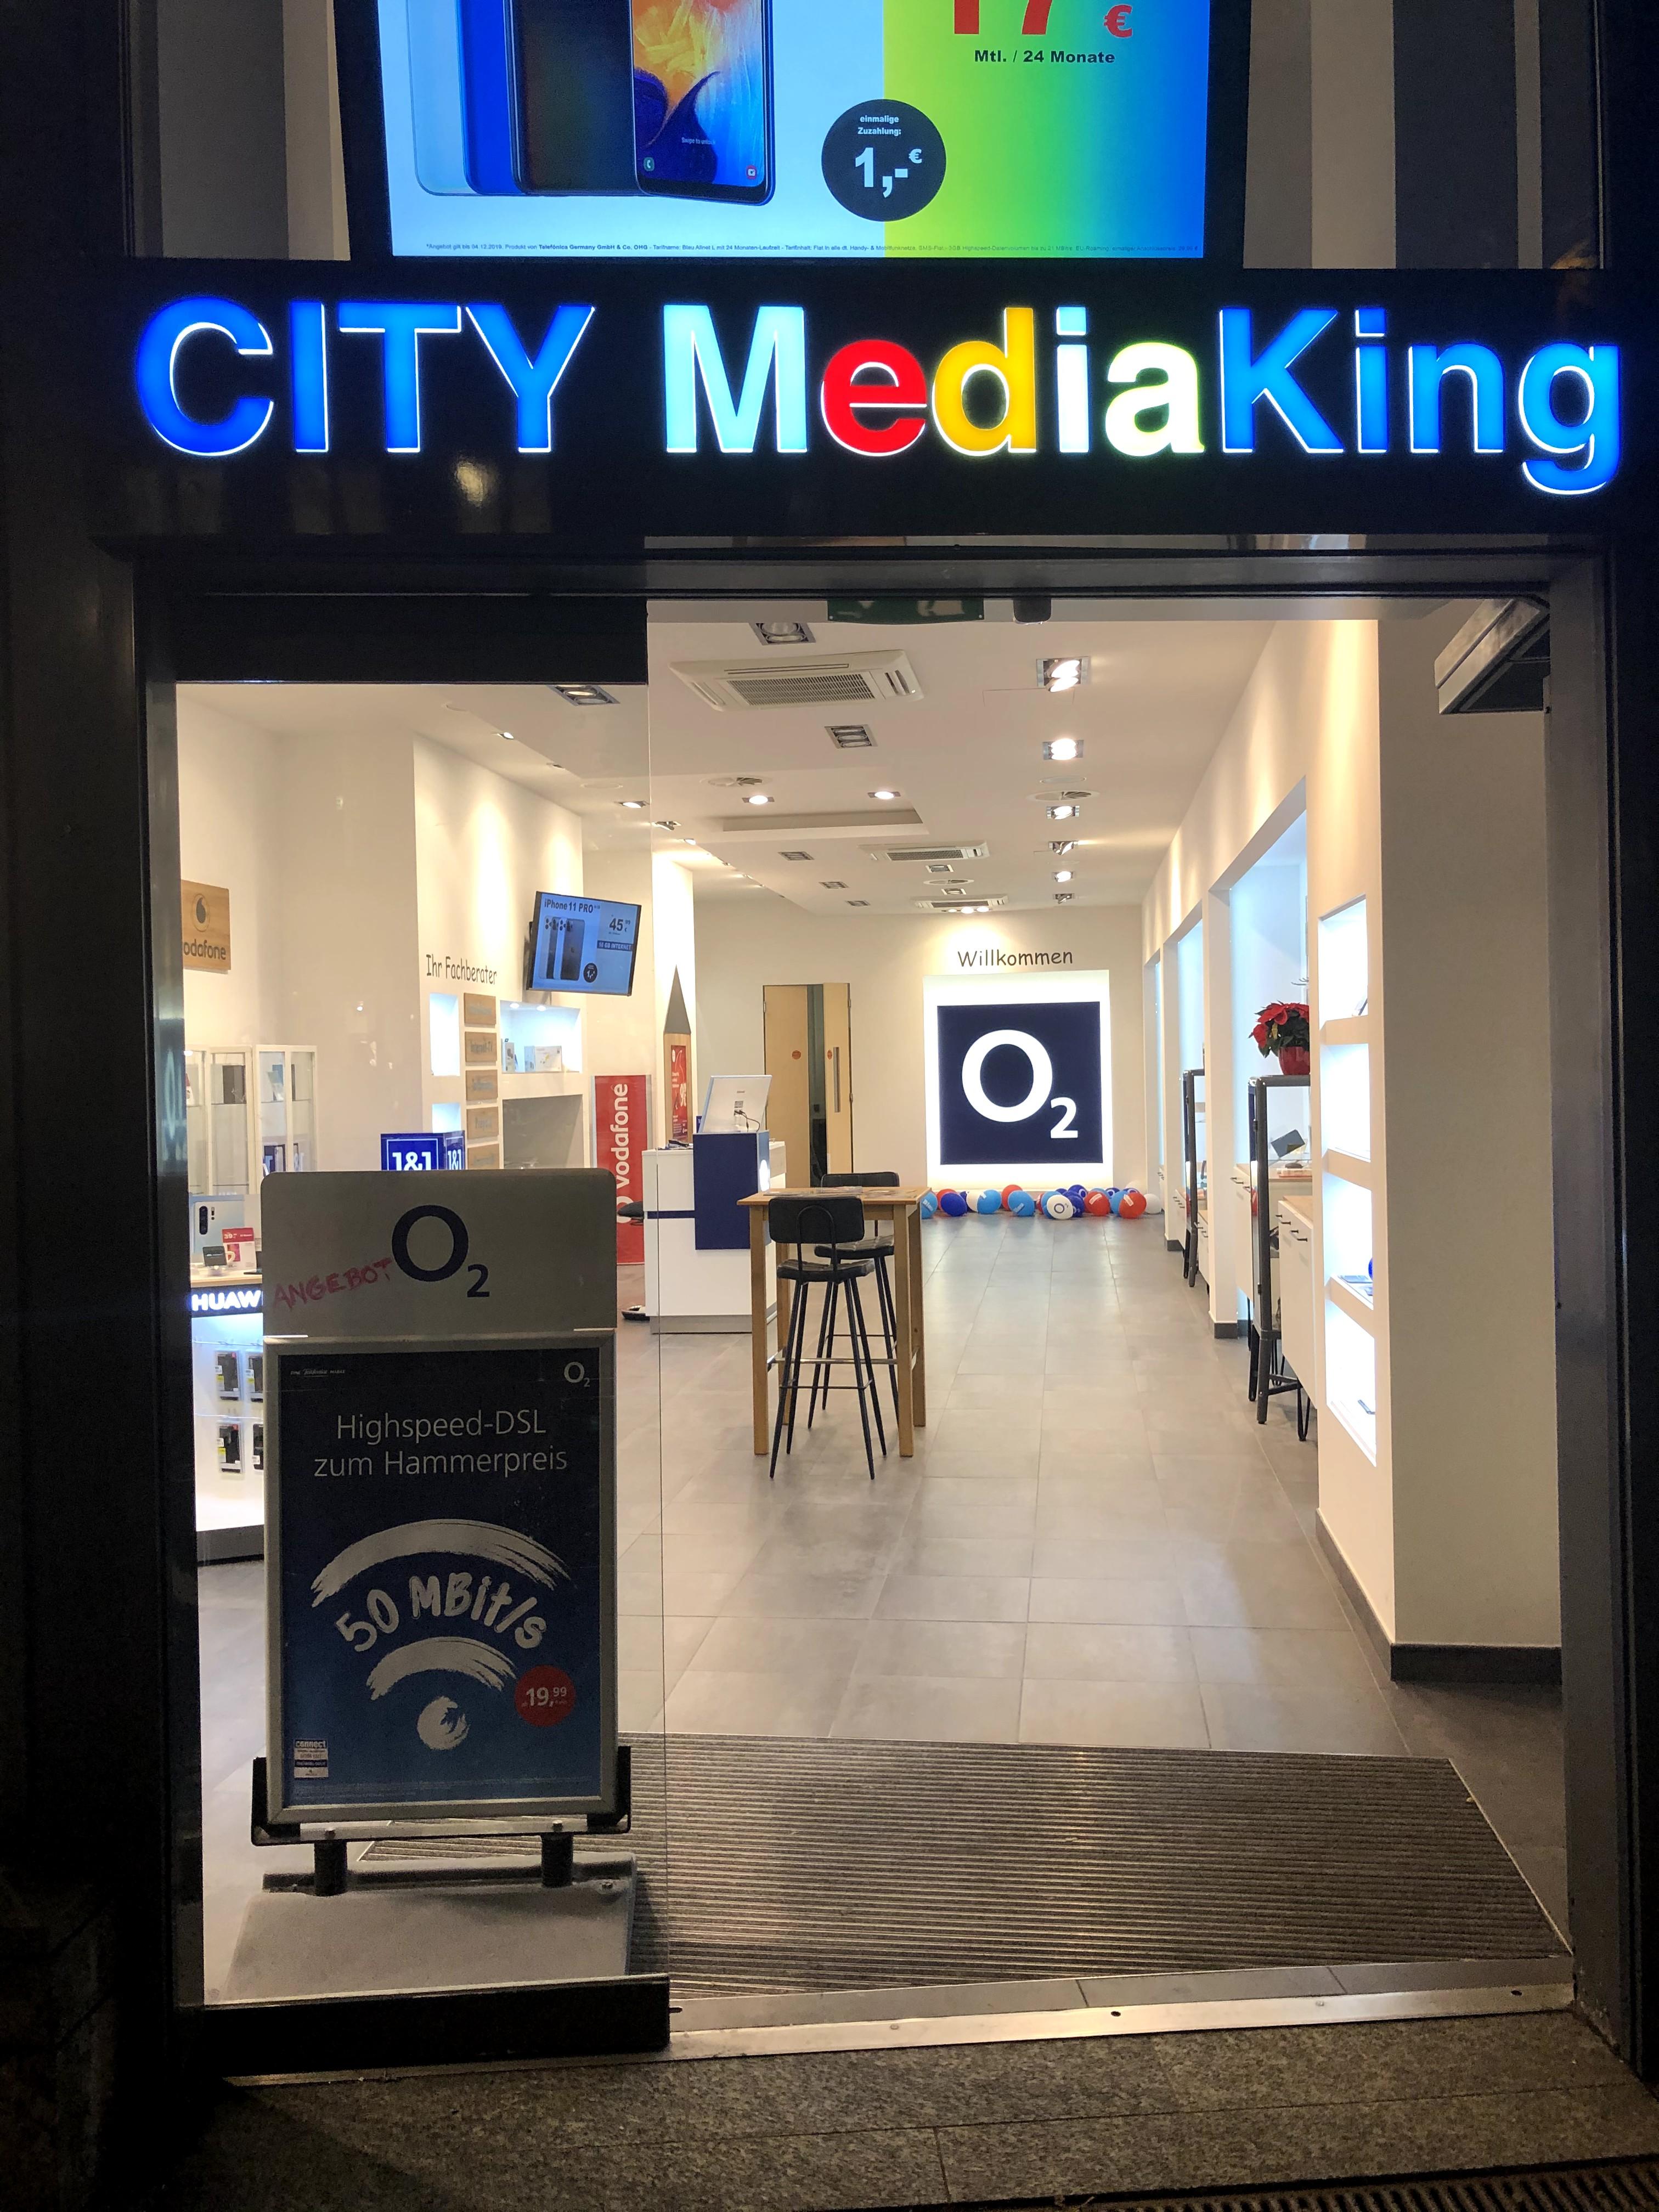 City MediaKing O2 & Vodafone Partner